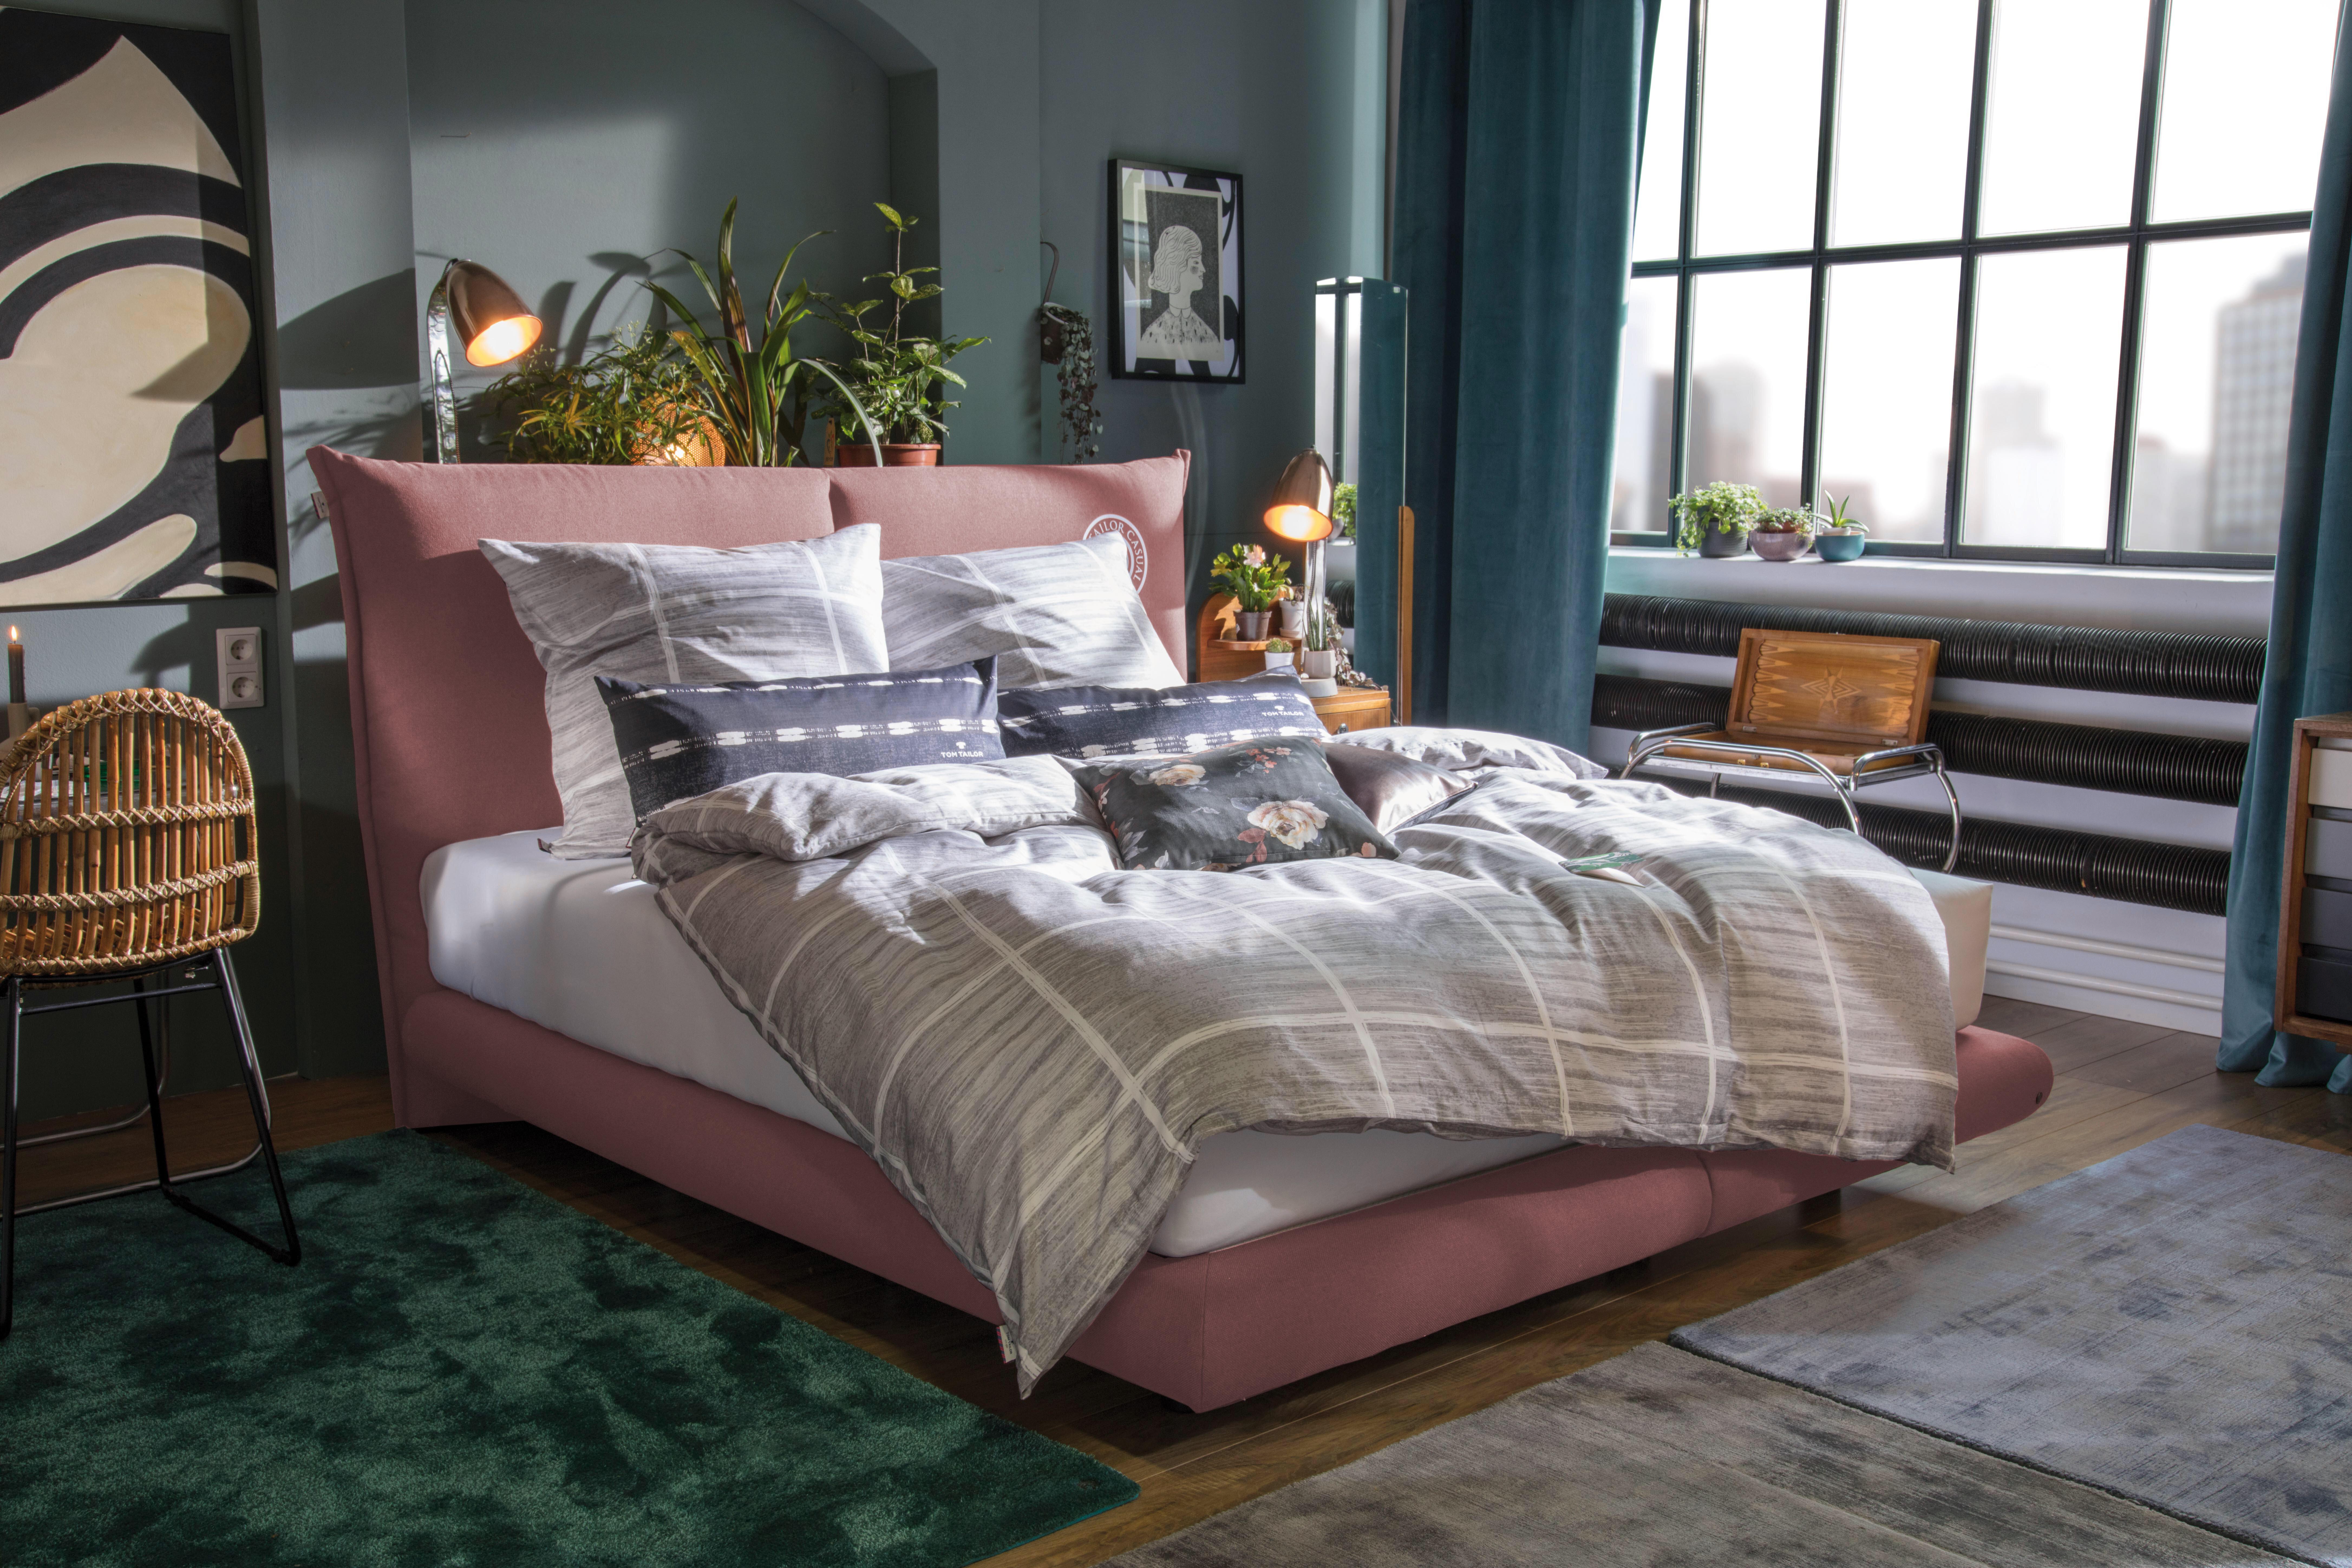 Tom tailor boxspringbett soho pillow mit print wayfair.de